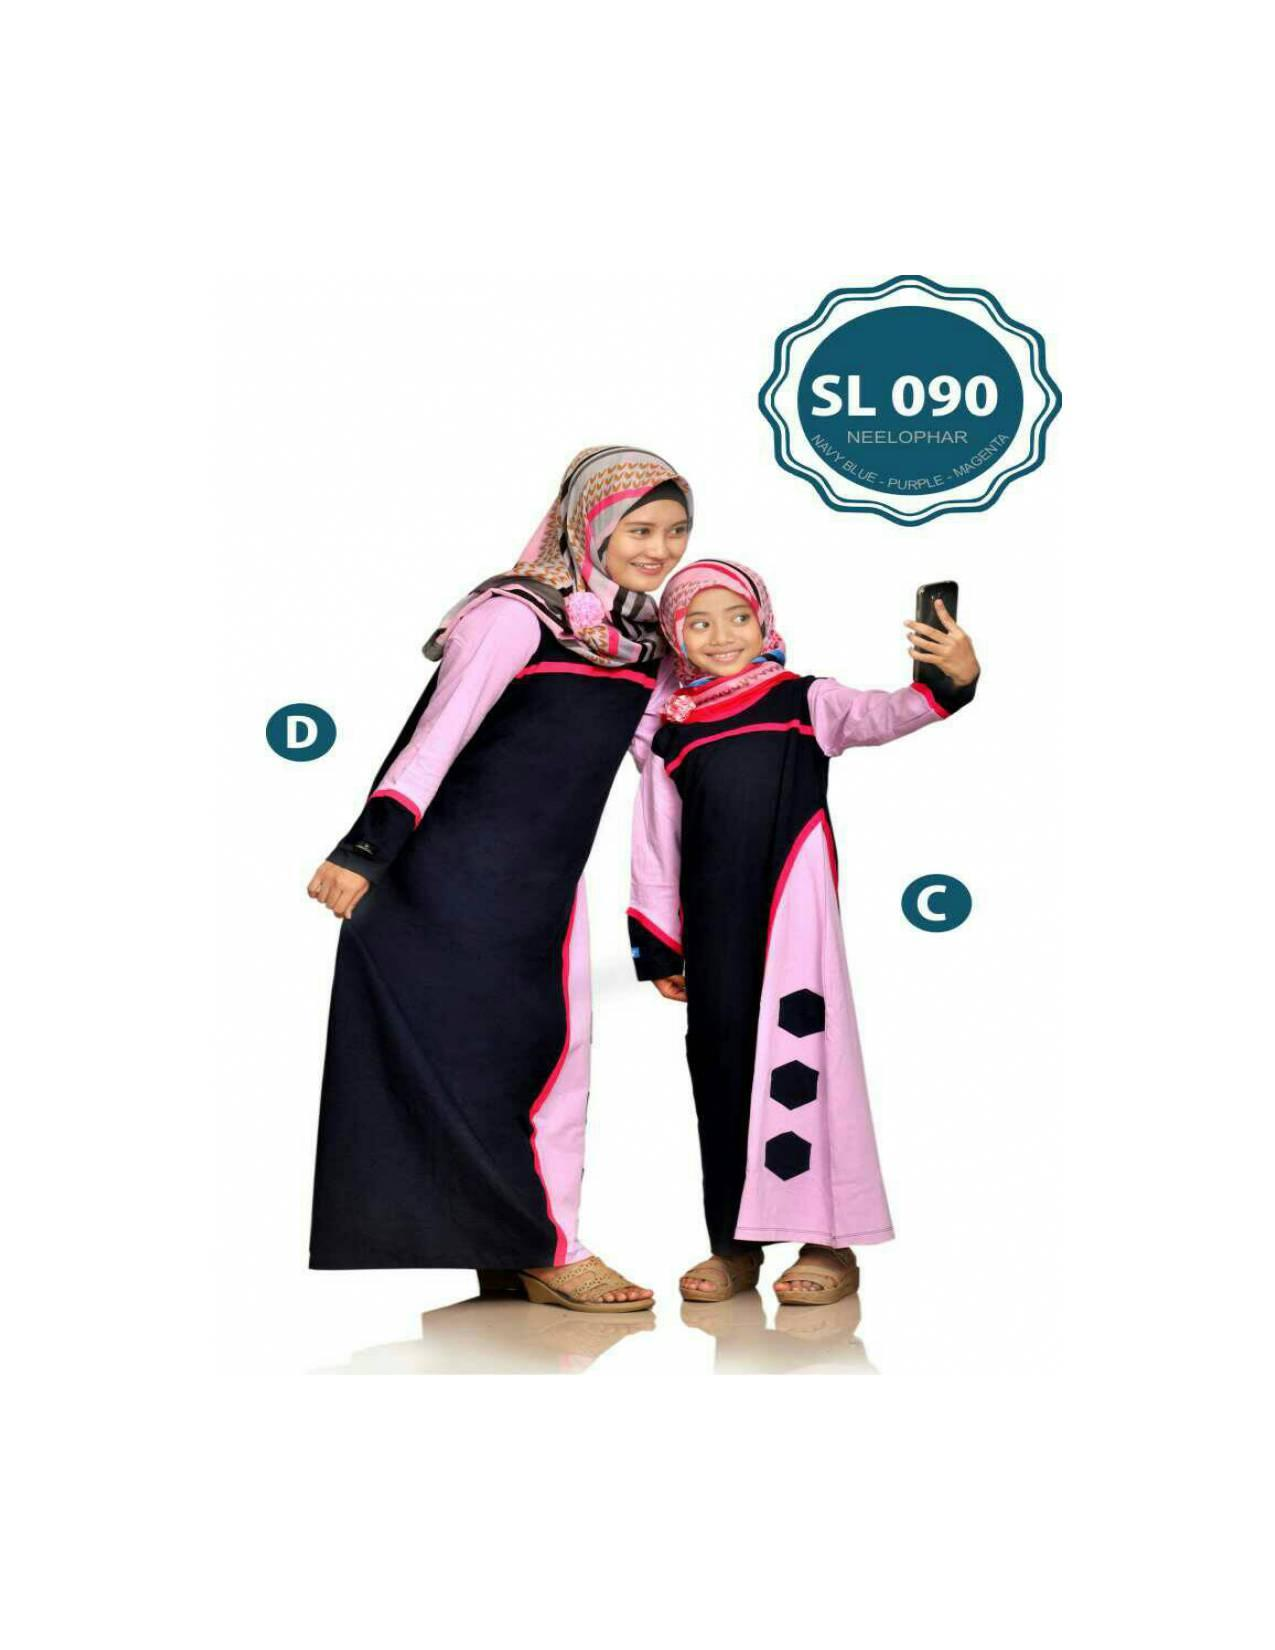 SL 090 KAOS KELUARGA COUPLE MUSLIMAH BAJU IBU DAN ANAK GAMIS KAOS